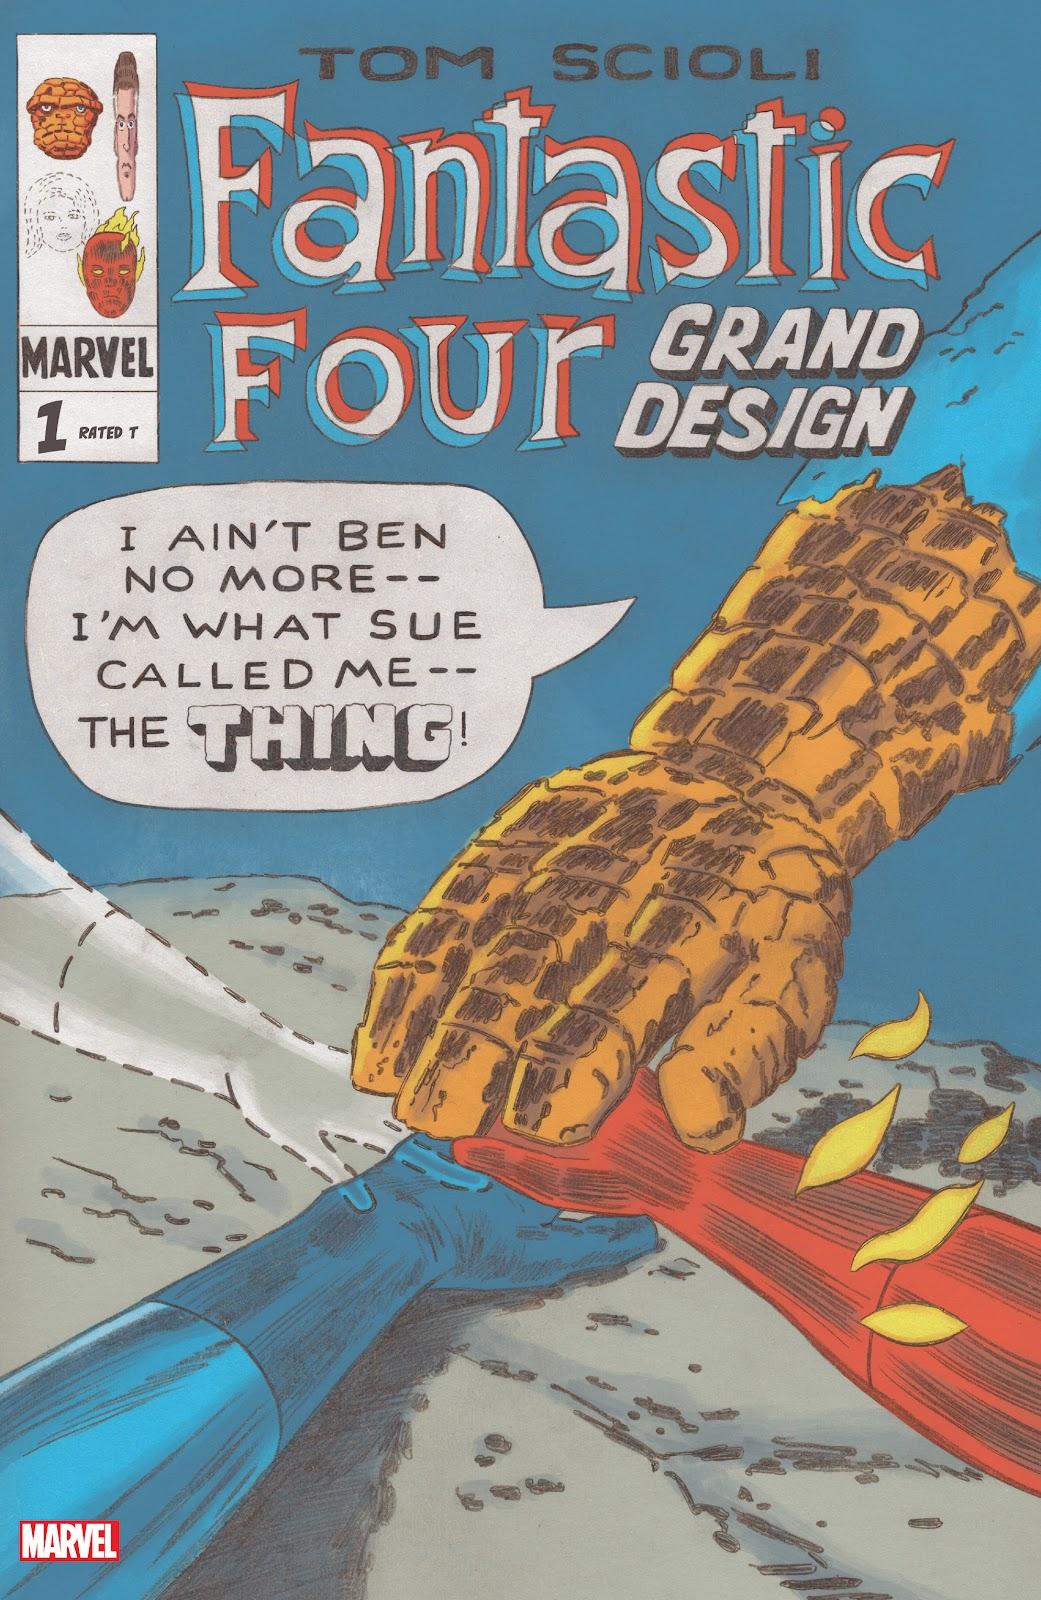 Read online Fantastic Four: Grand Design comic -  Issue #1 - 1